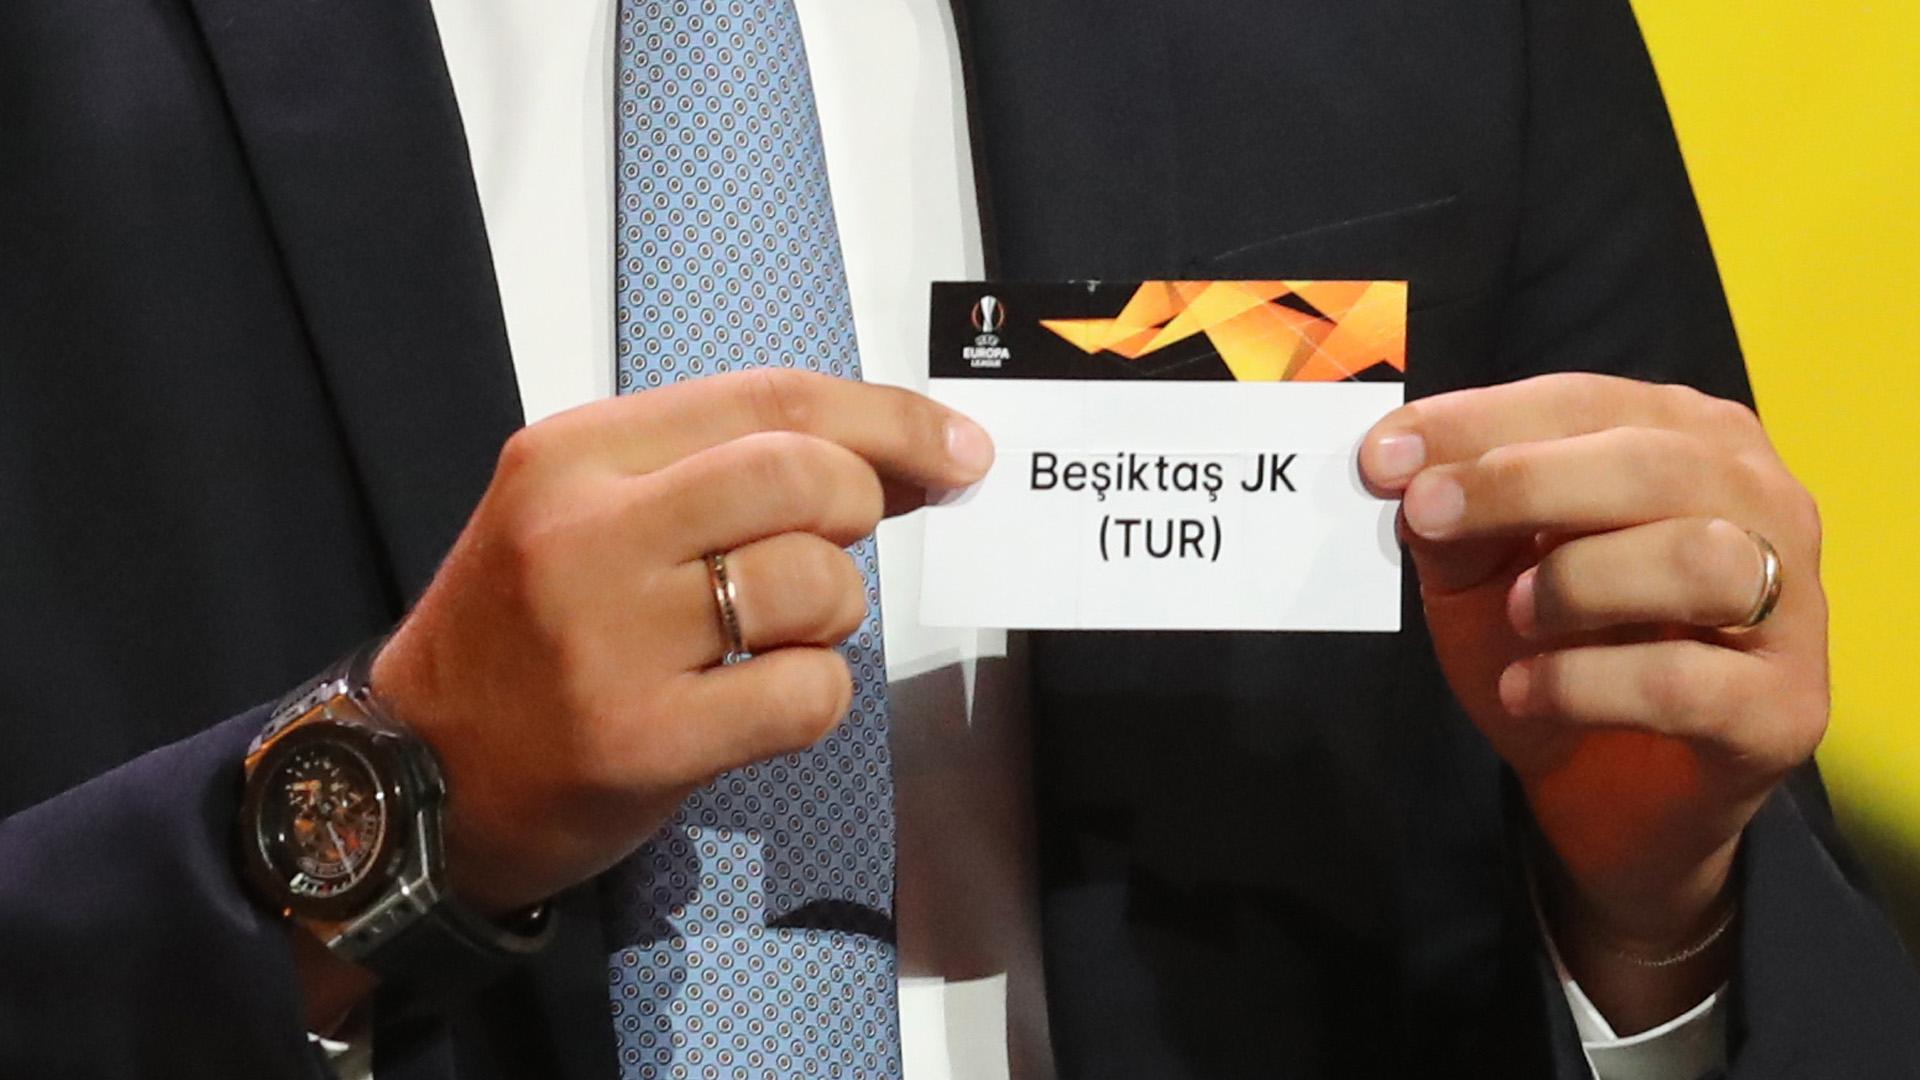 Besiktas Europa League 2018